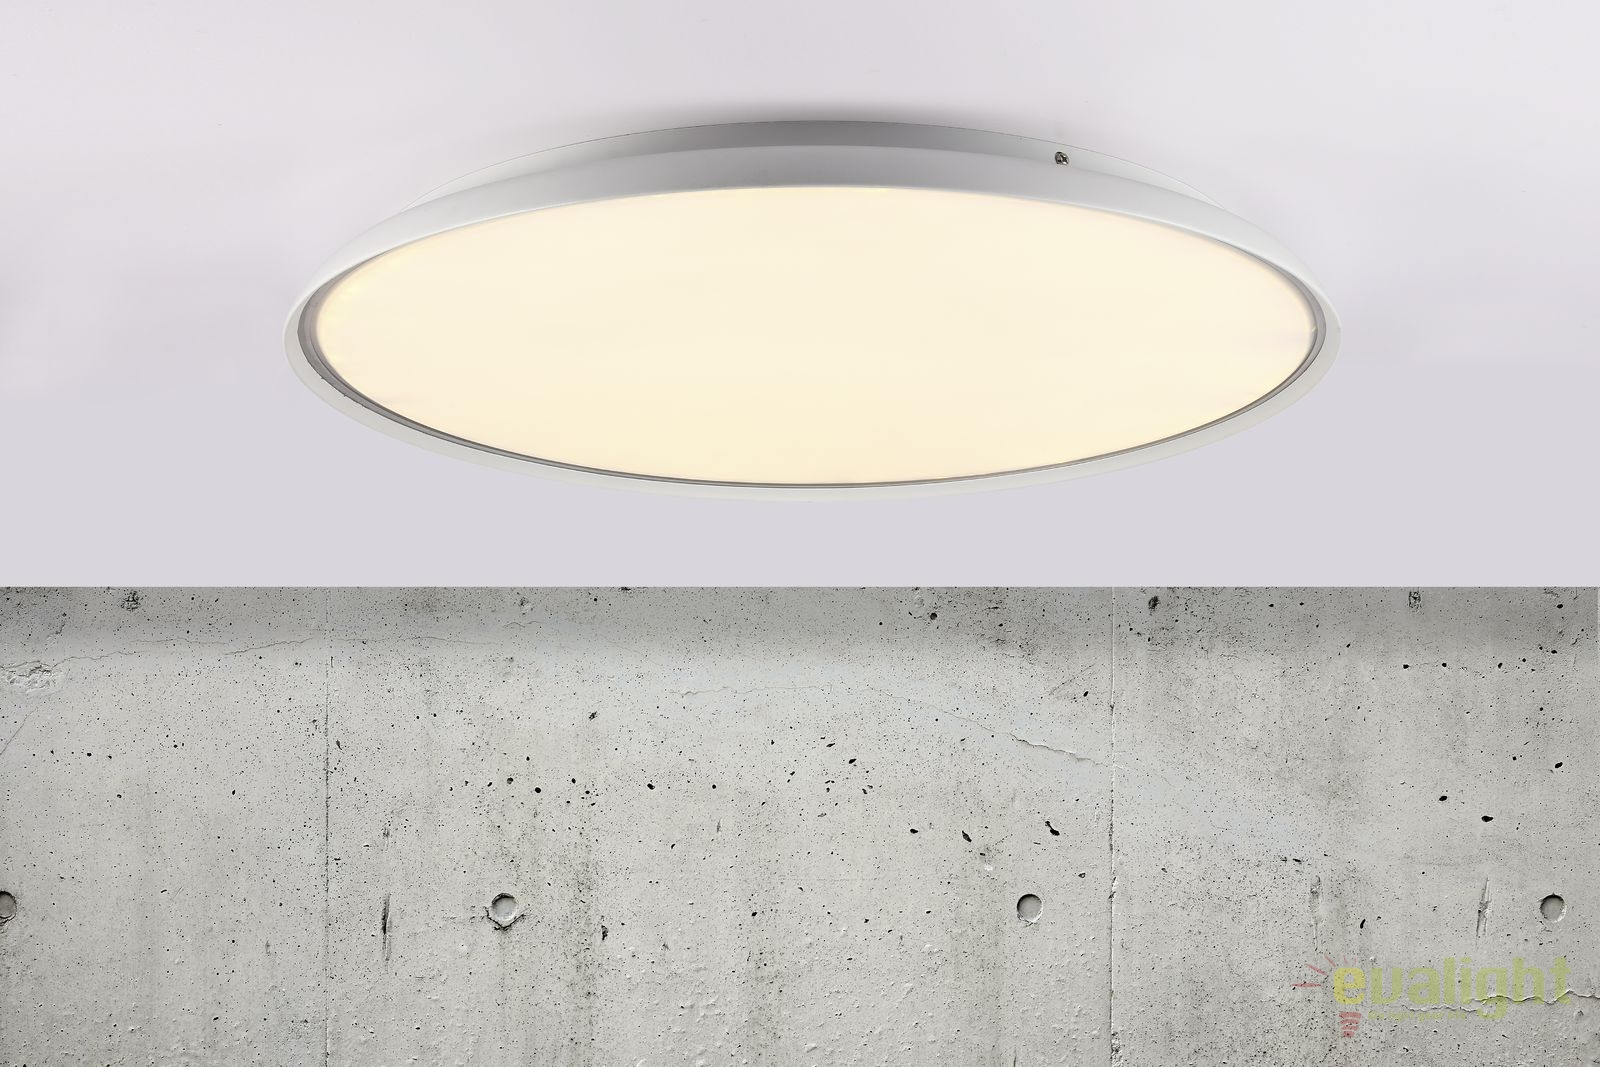 Plafoniere Led Moderne : Plafoniera led design modern diam. 60cm la luna 45316001 dftp